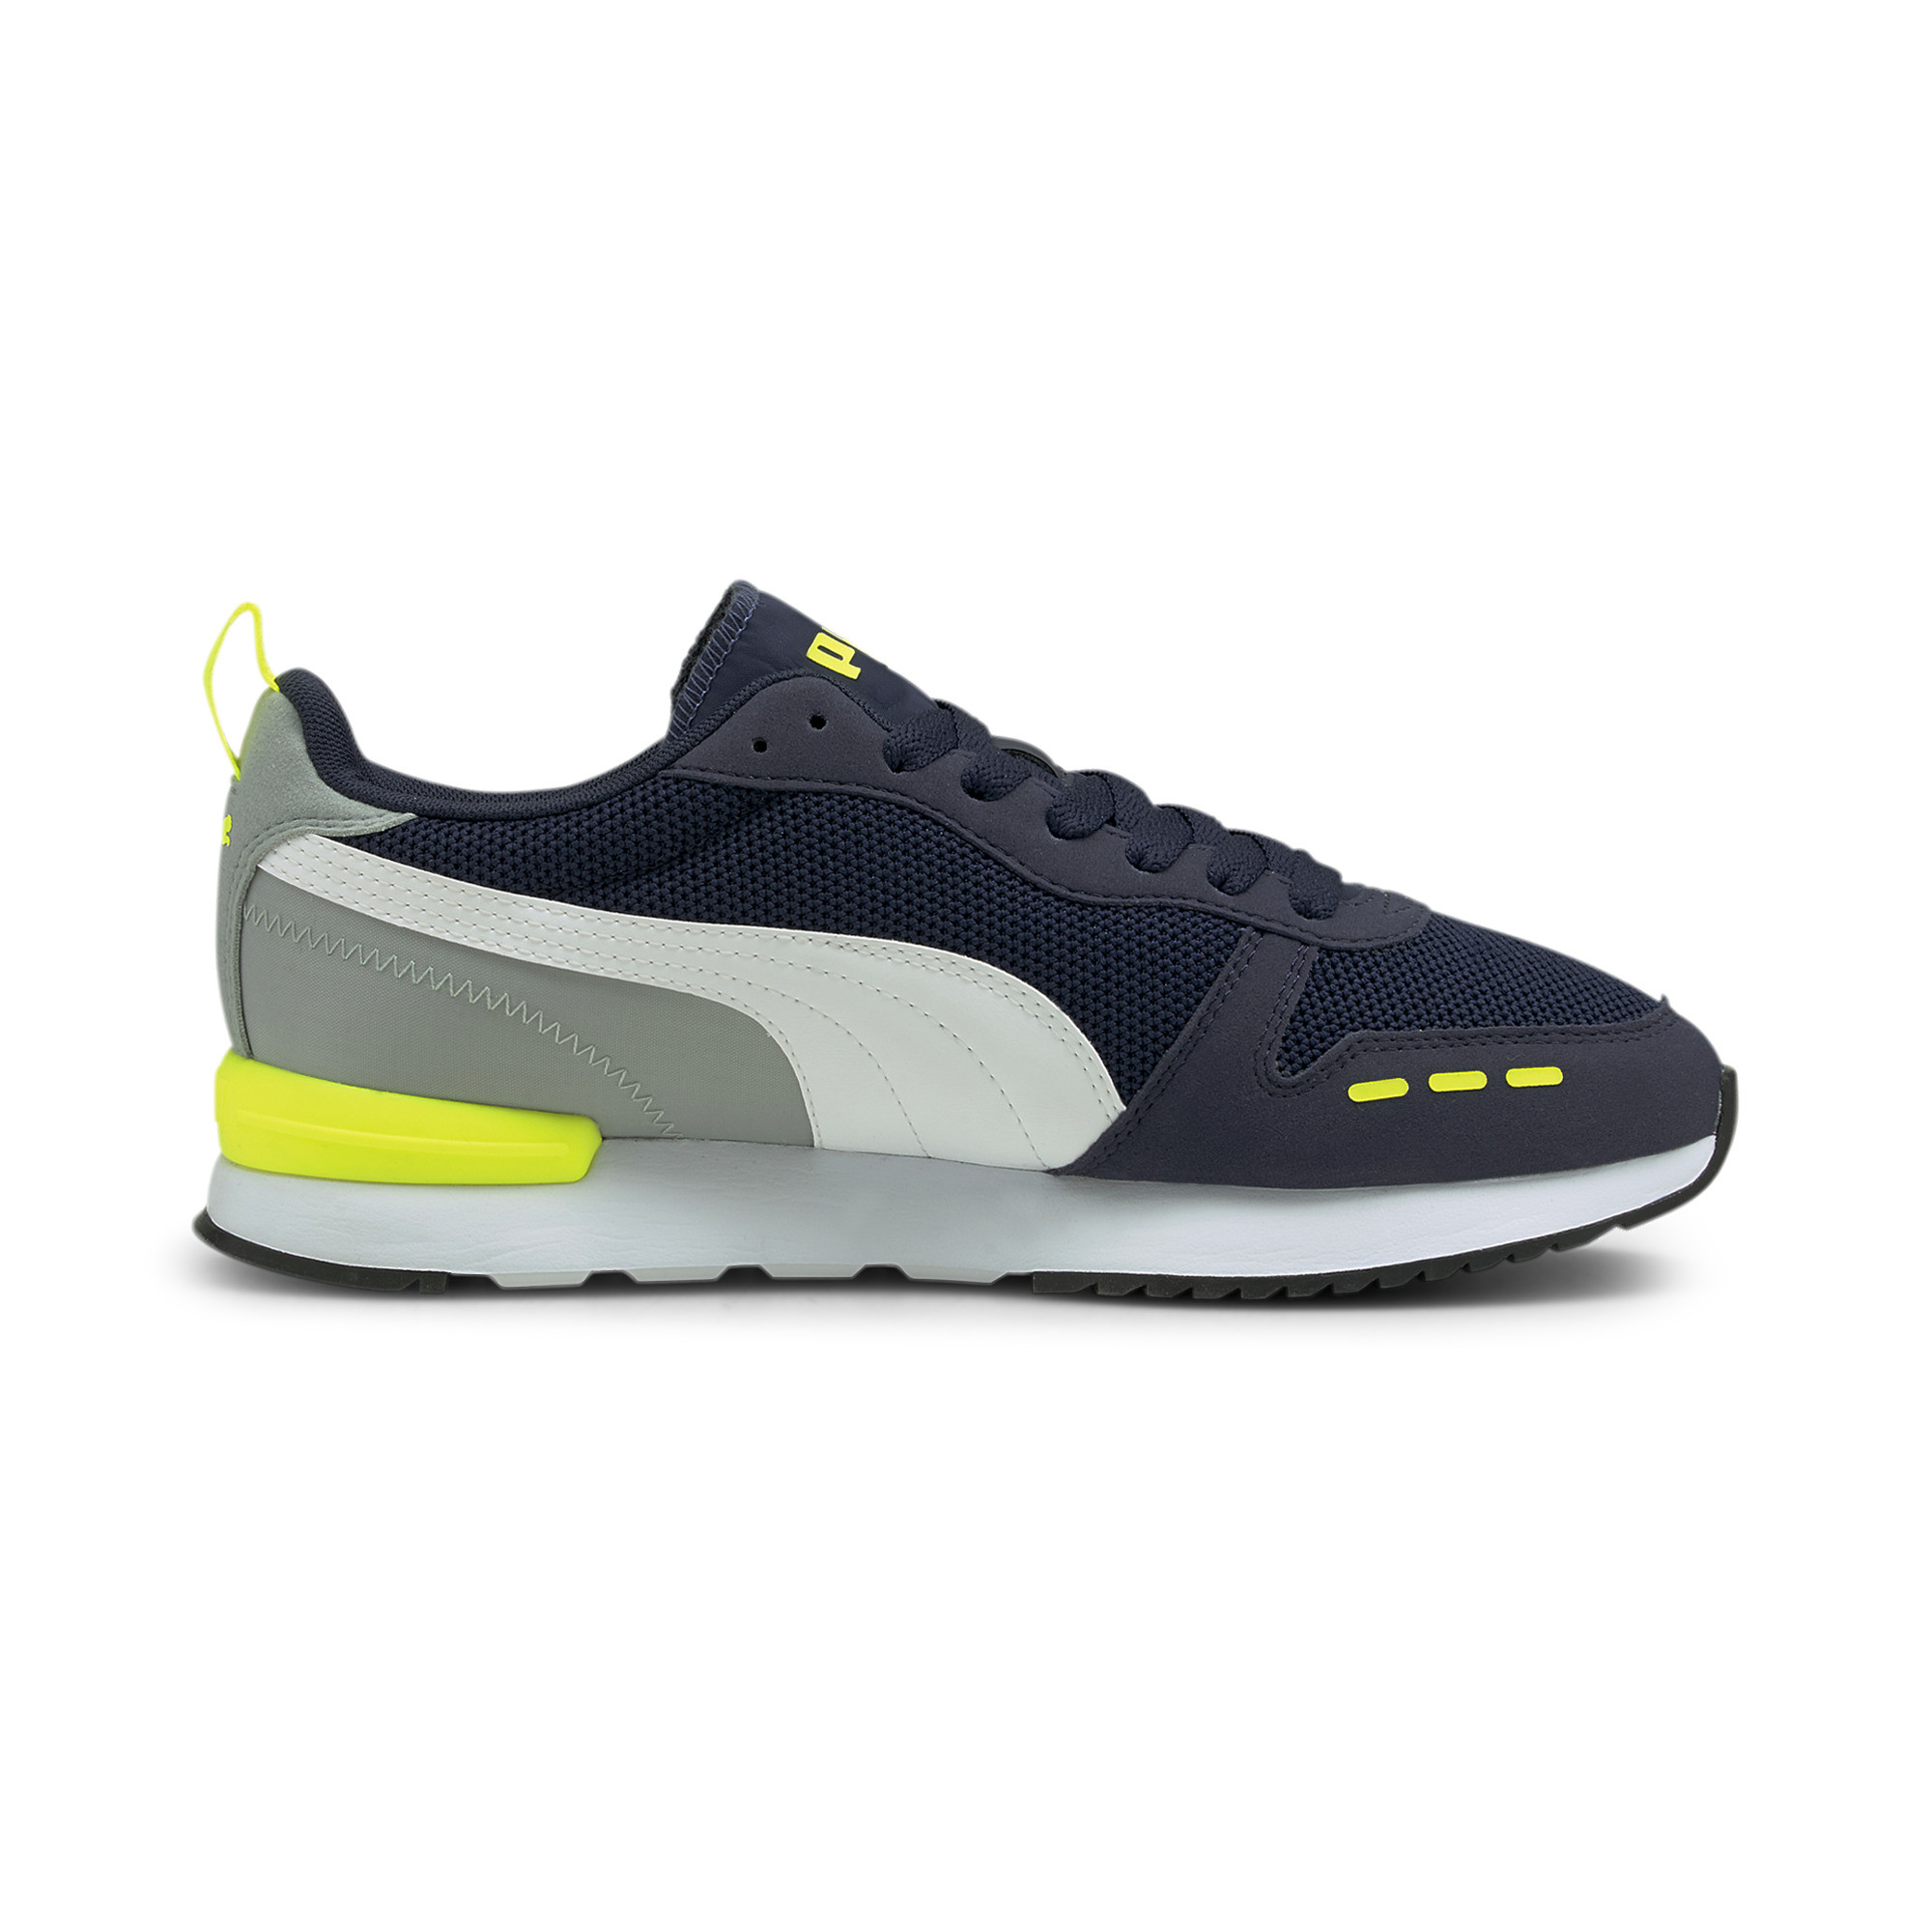 thumbnail 21 - PUMA-Men-039-s-R78-Sneakers